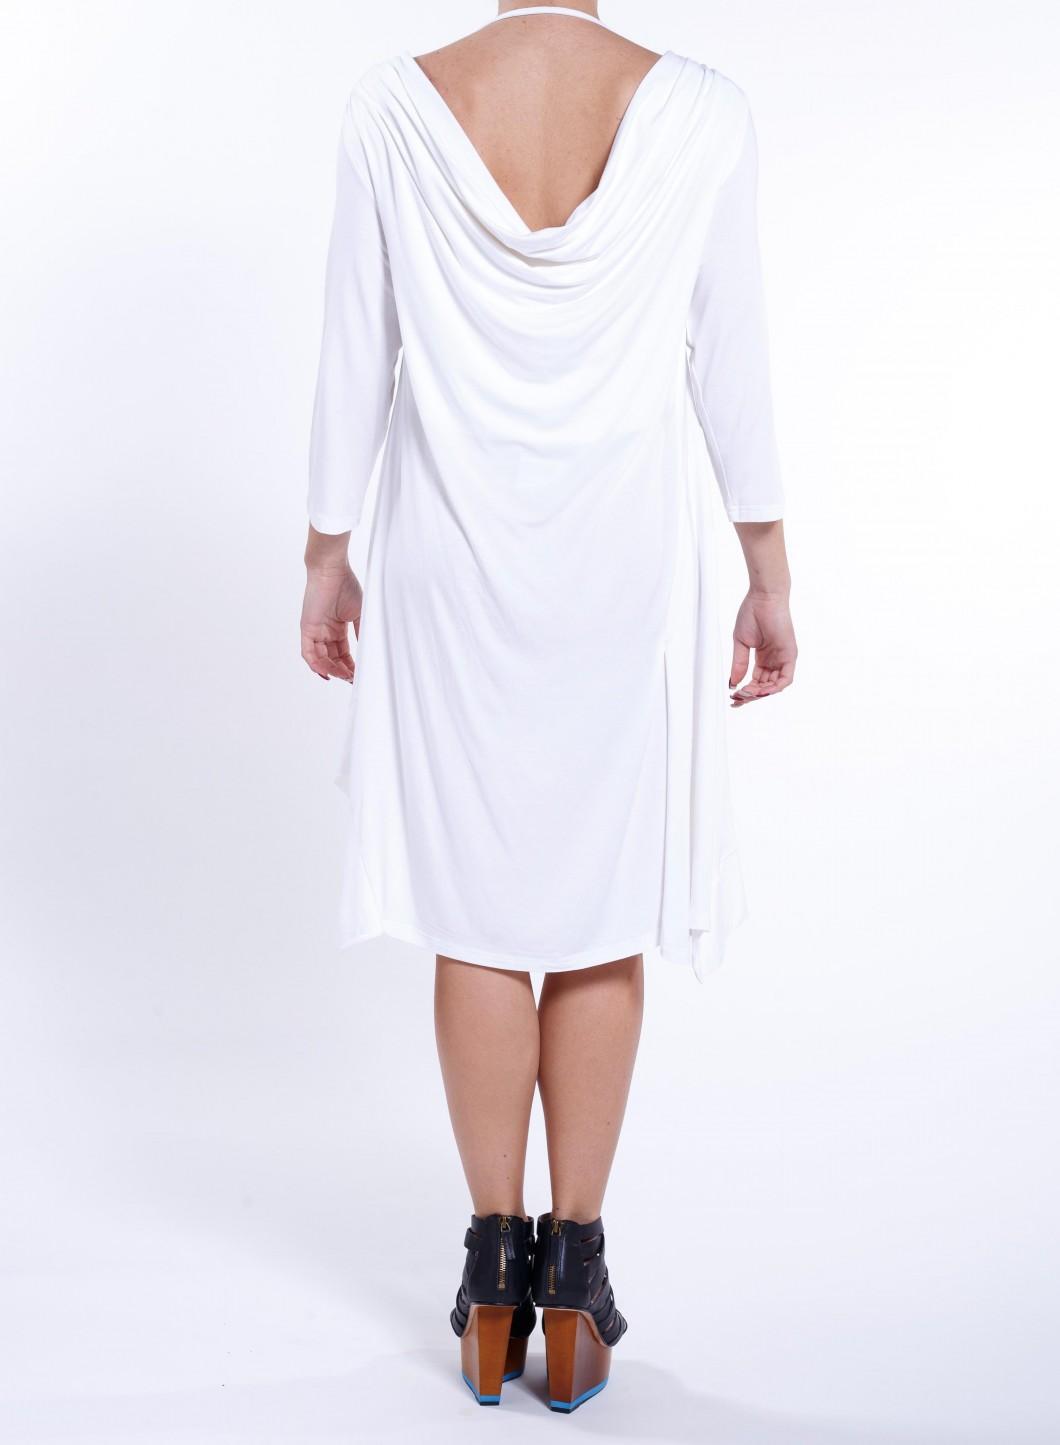 efea3eb896d7 ... Φορεμα Cloud Mini Ελαστικο 50 50